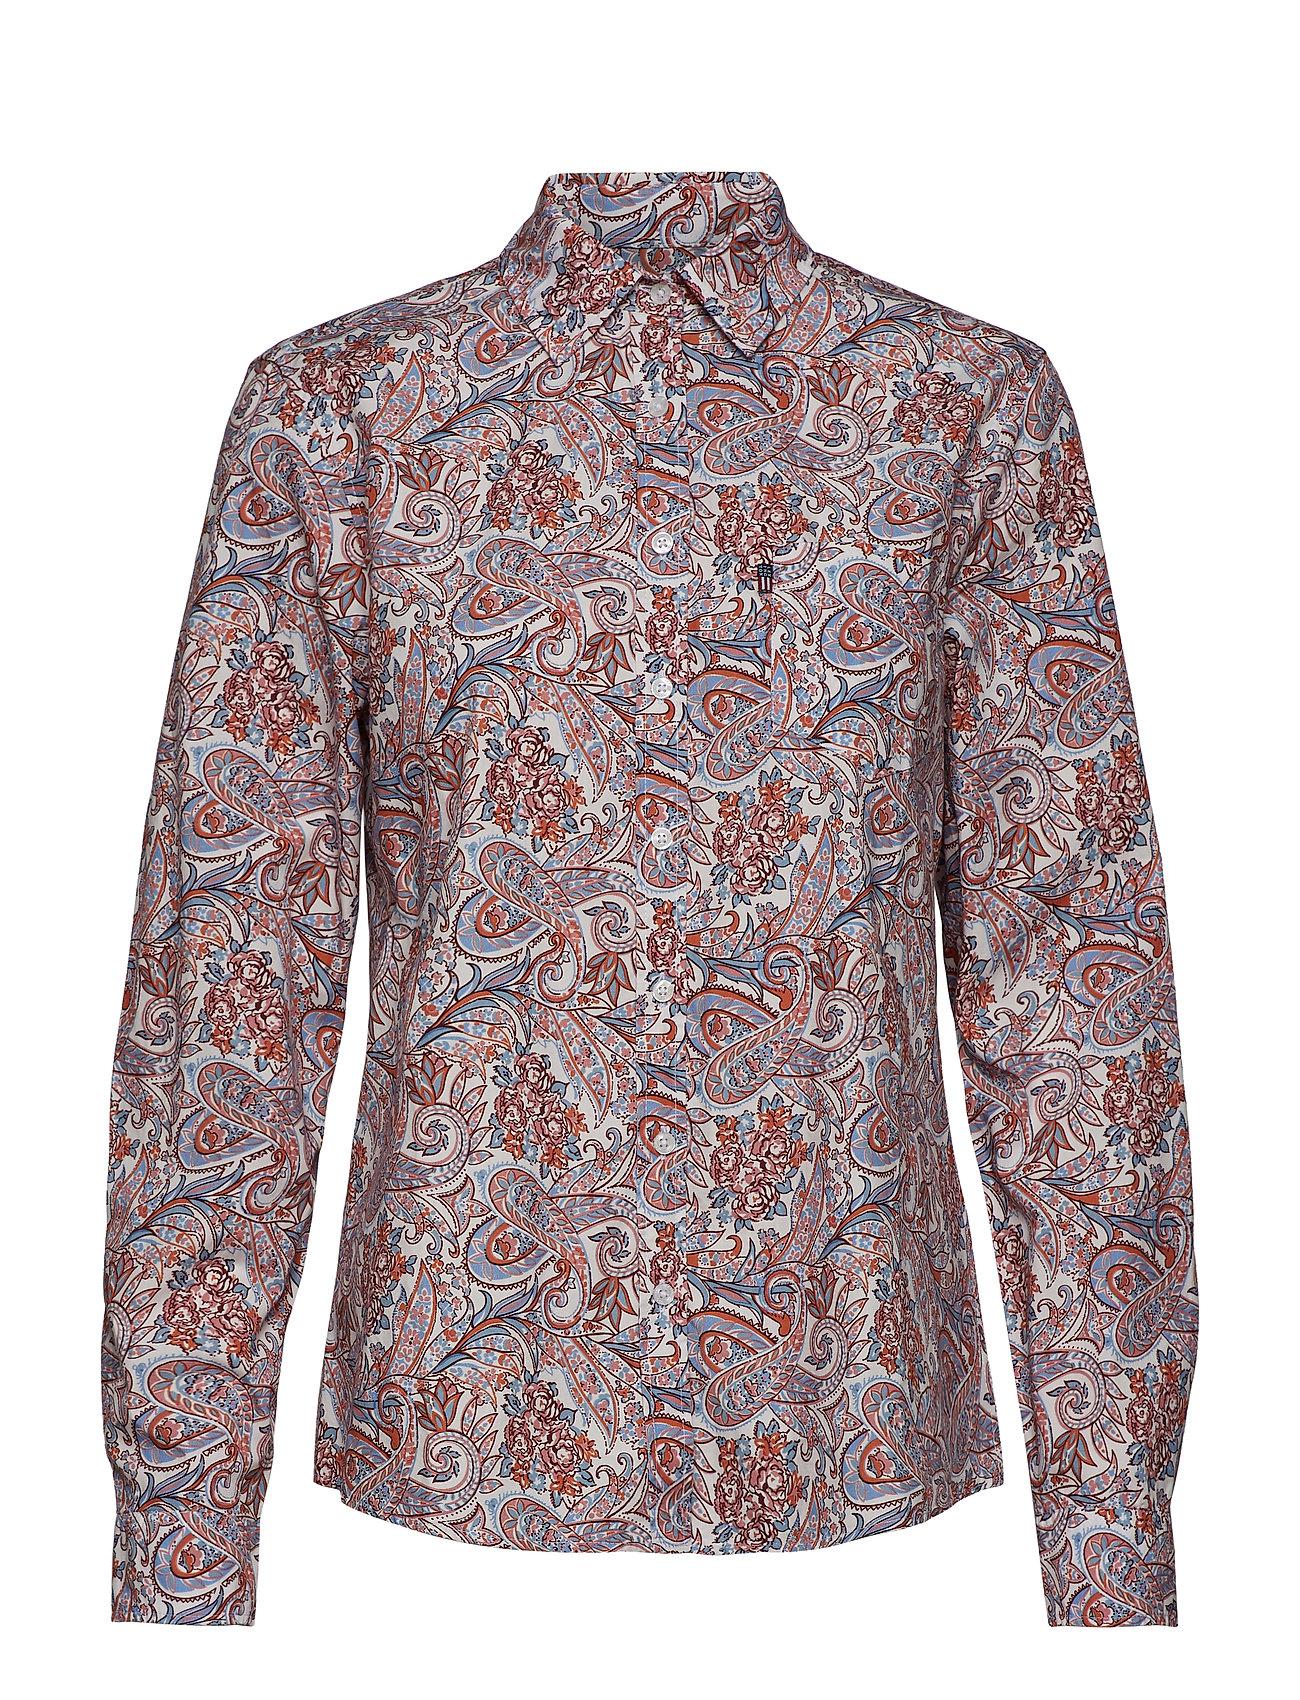 Lexington Clothing Emily Poplin Shirt - PAISLEY PRINT